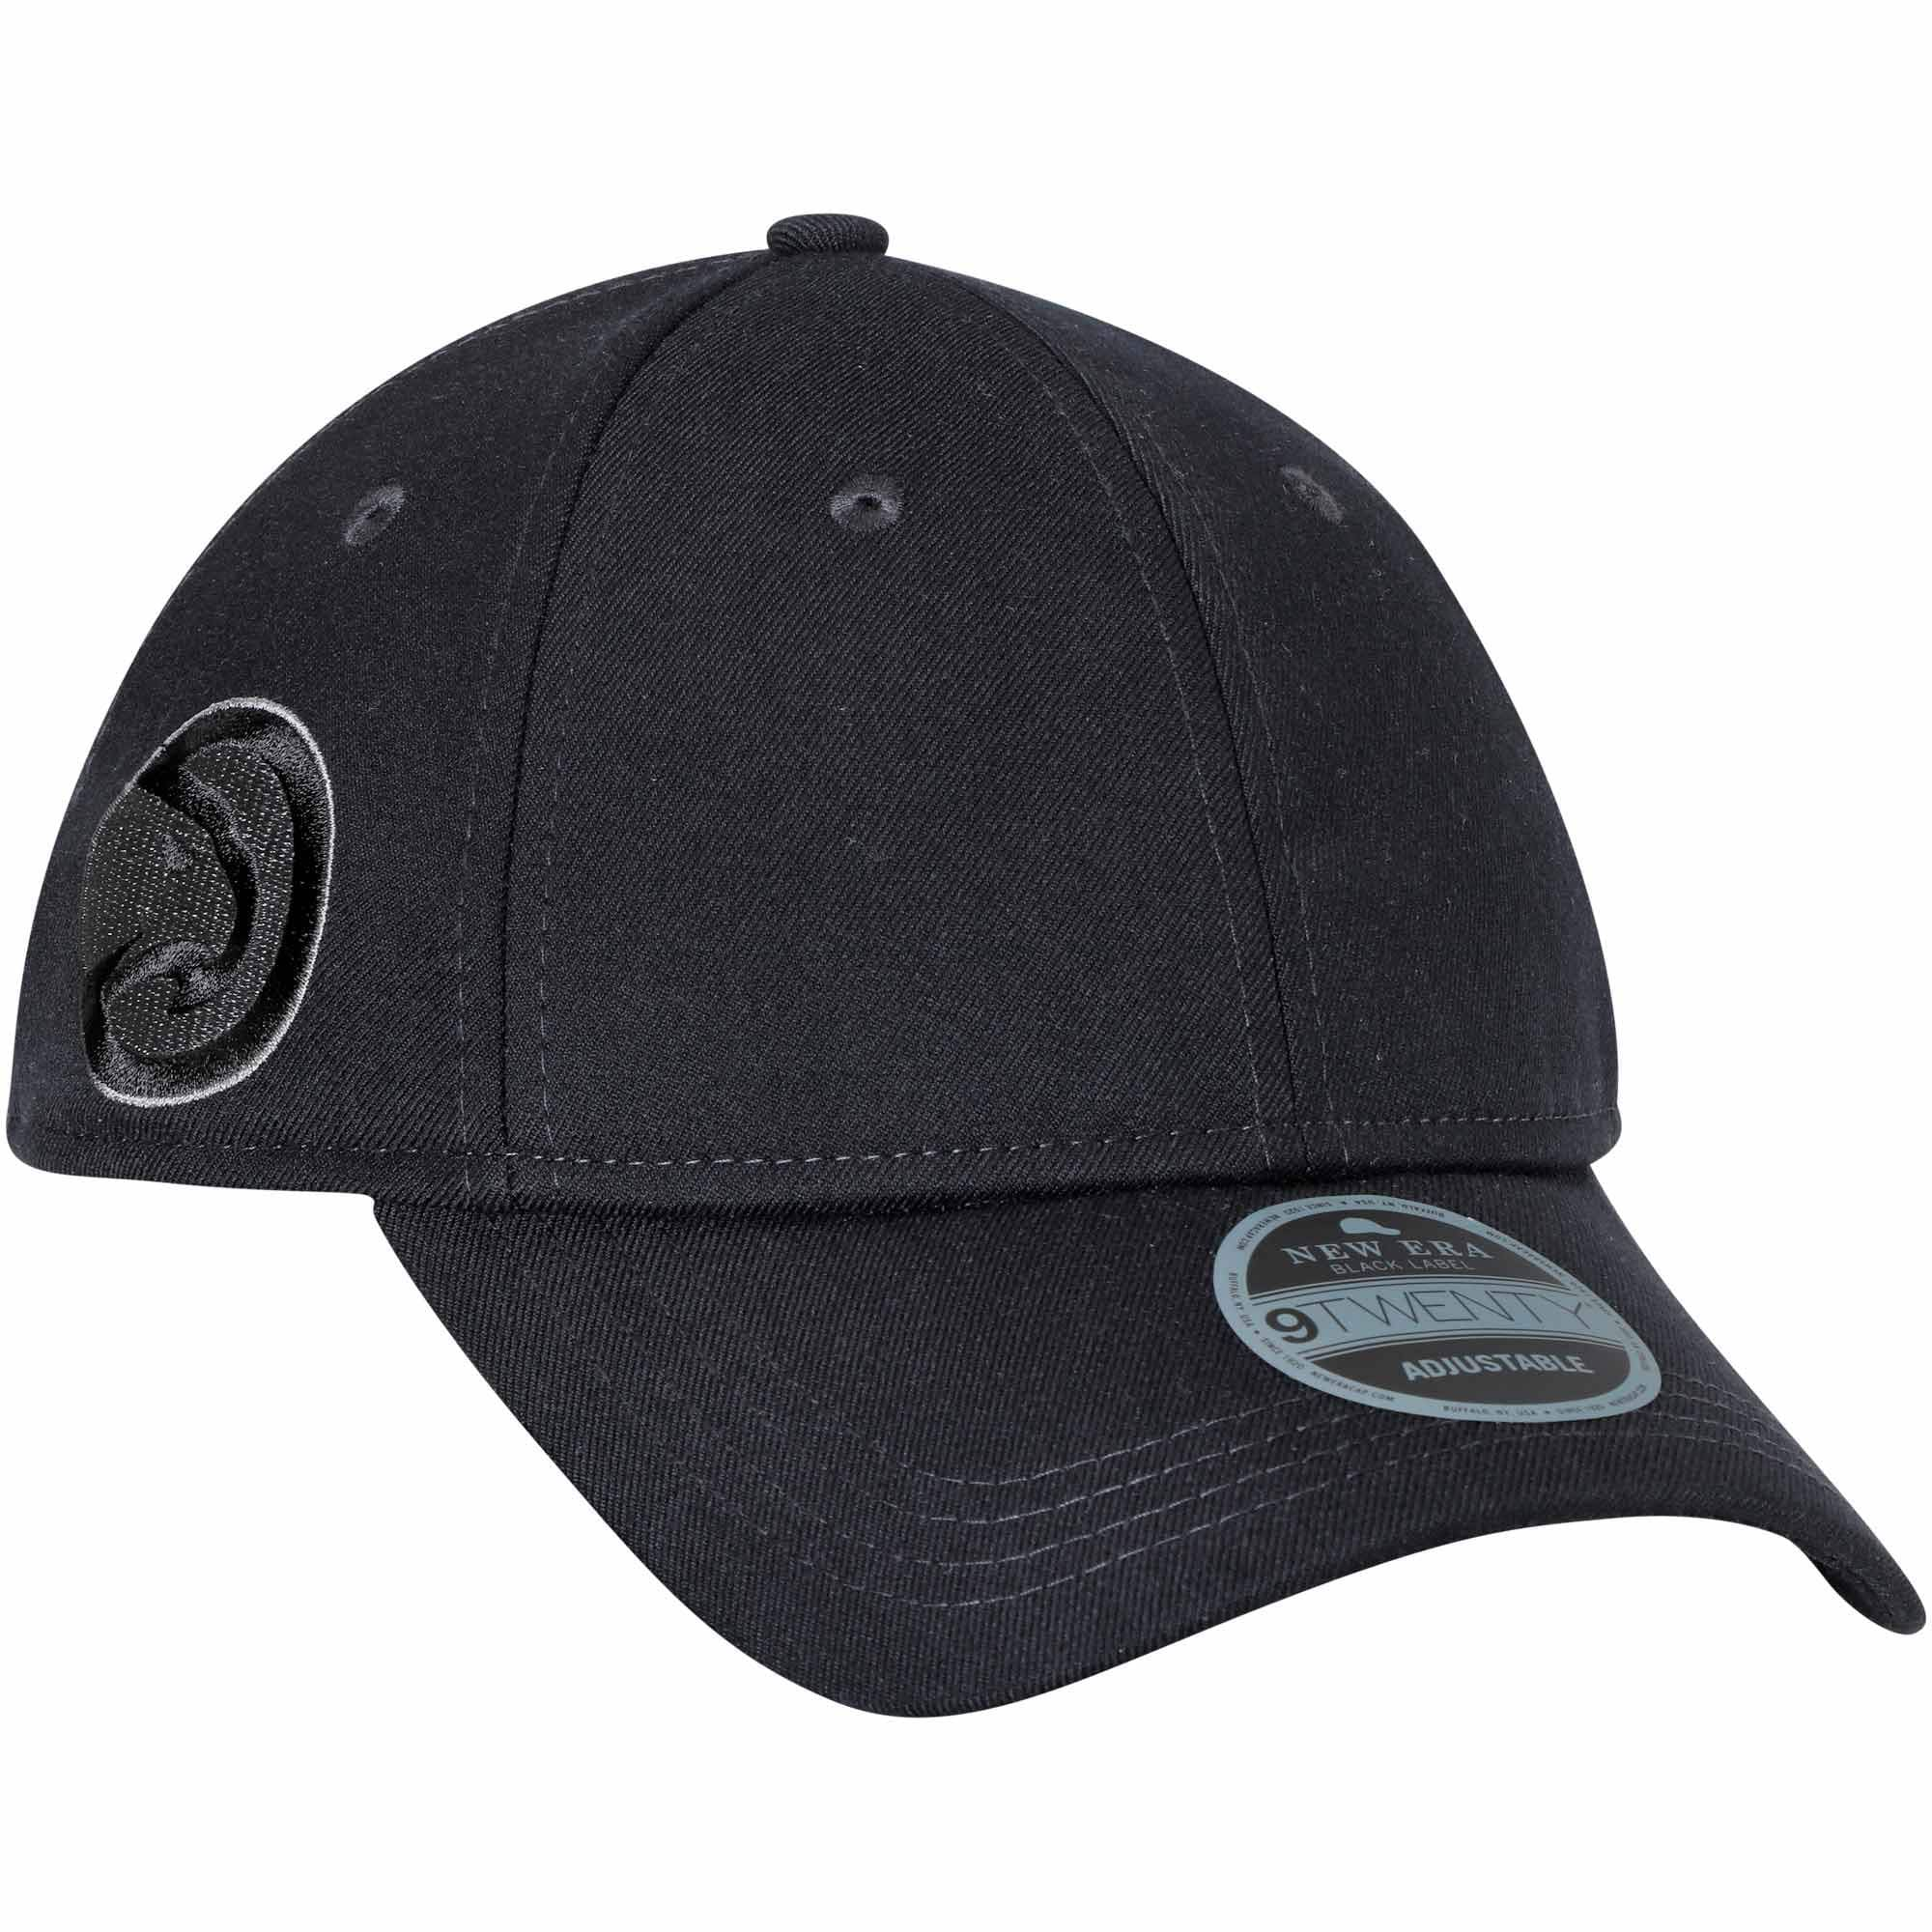 Atlanta Hawks New Era Black Label Series Suiting 9TWENTY Adjustable Hat - Black